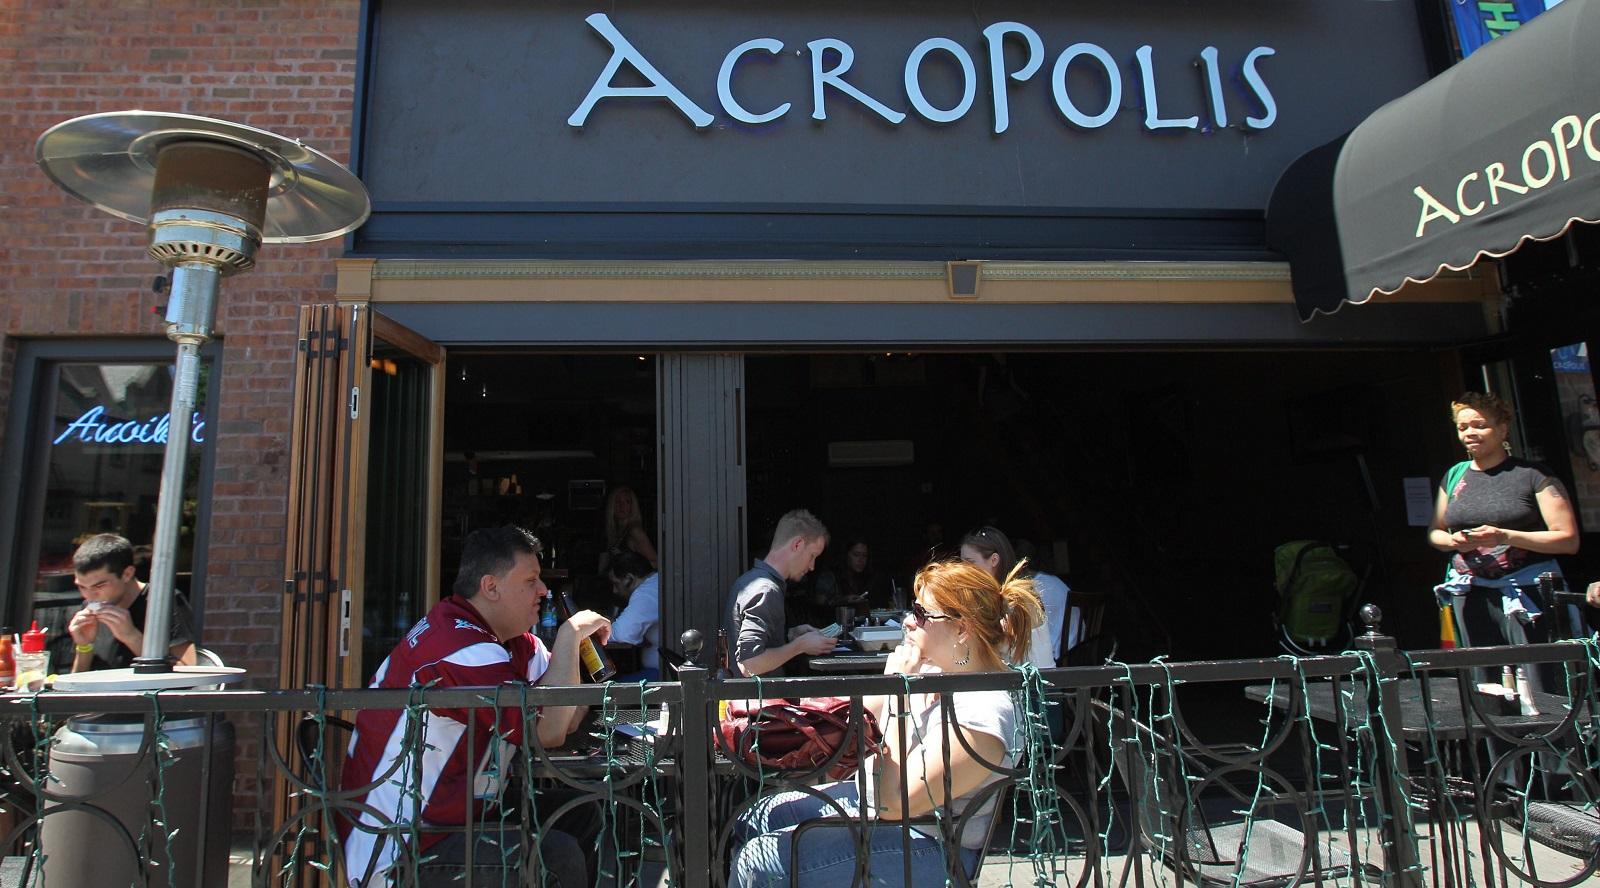 Acropolis' menu will change to become more Greek-centric. (Sharon Cantillon/Buffalo News)